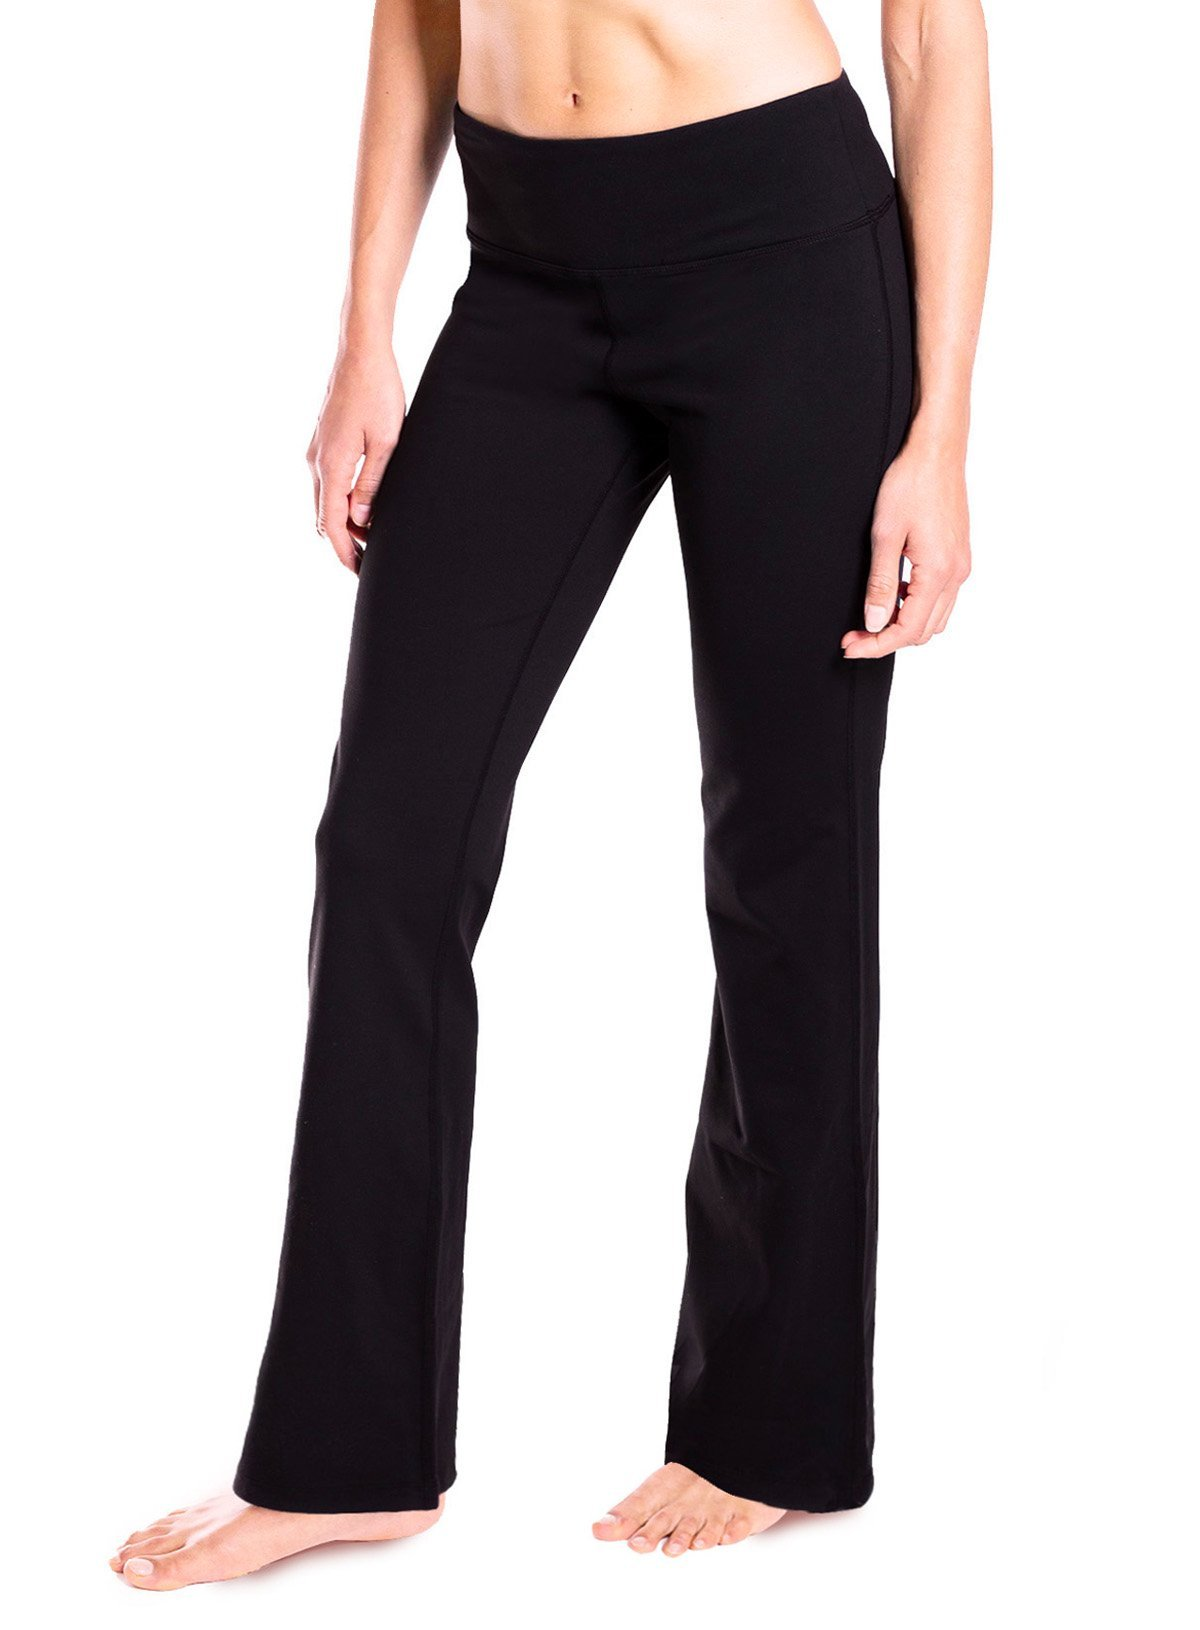 Yogipace 27''/28''/29''/30''/31''/32''/33''/35''/37'' Inseam,Petite/Regular/Tall, Women's Bootcut Yoga Pants Long Workout Pants, 28'', Black Size XL by Yogipace (Image #2)